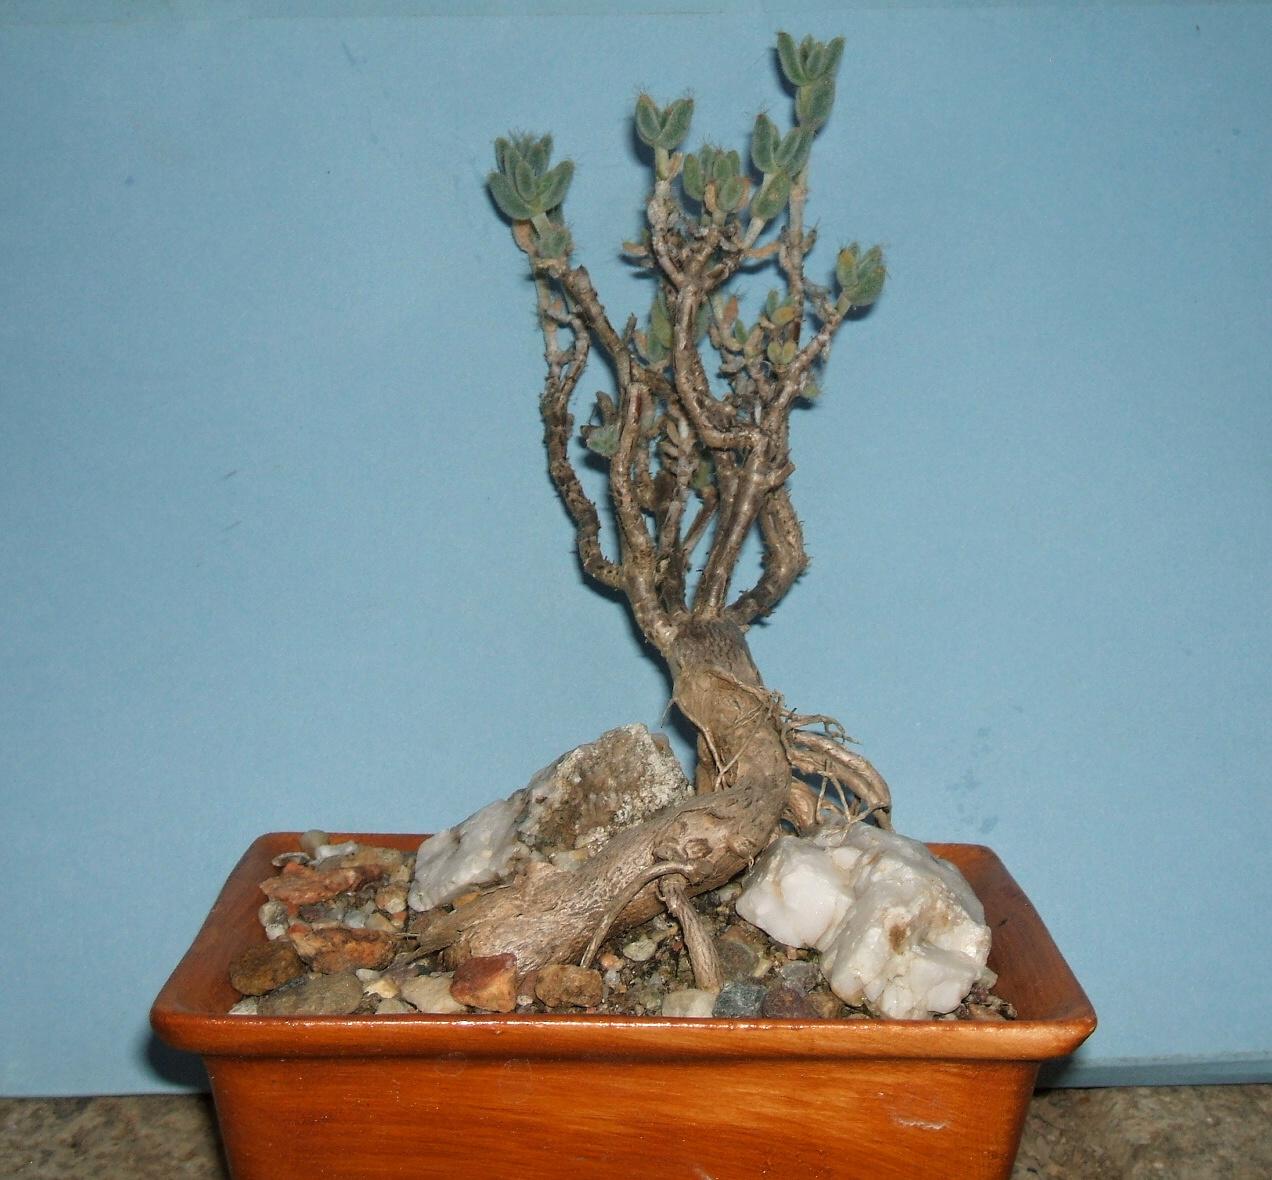 trichodiadema-litllewoodi